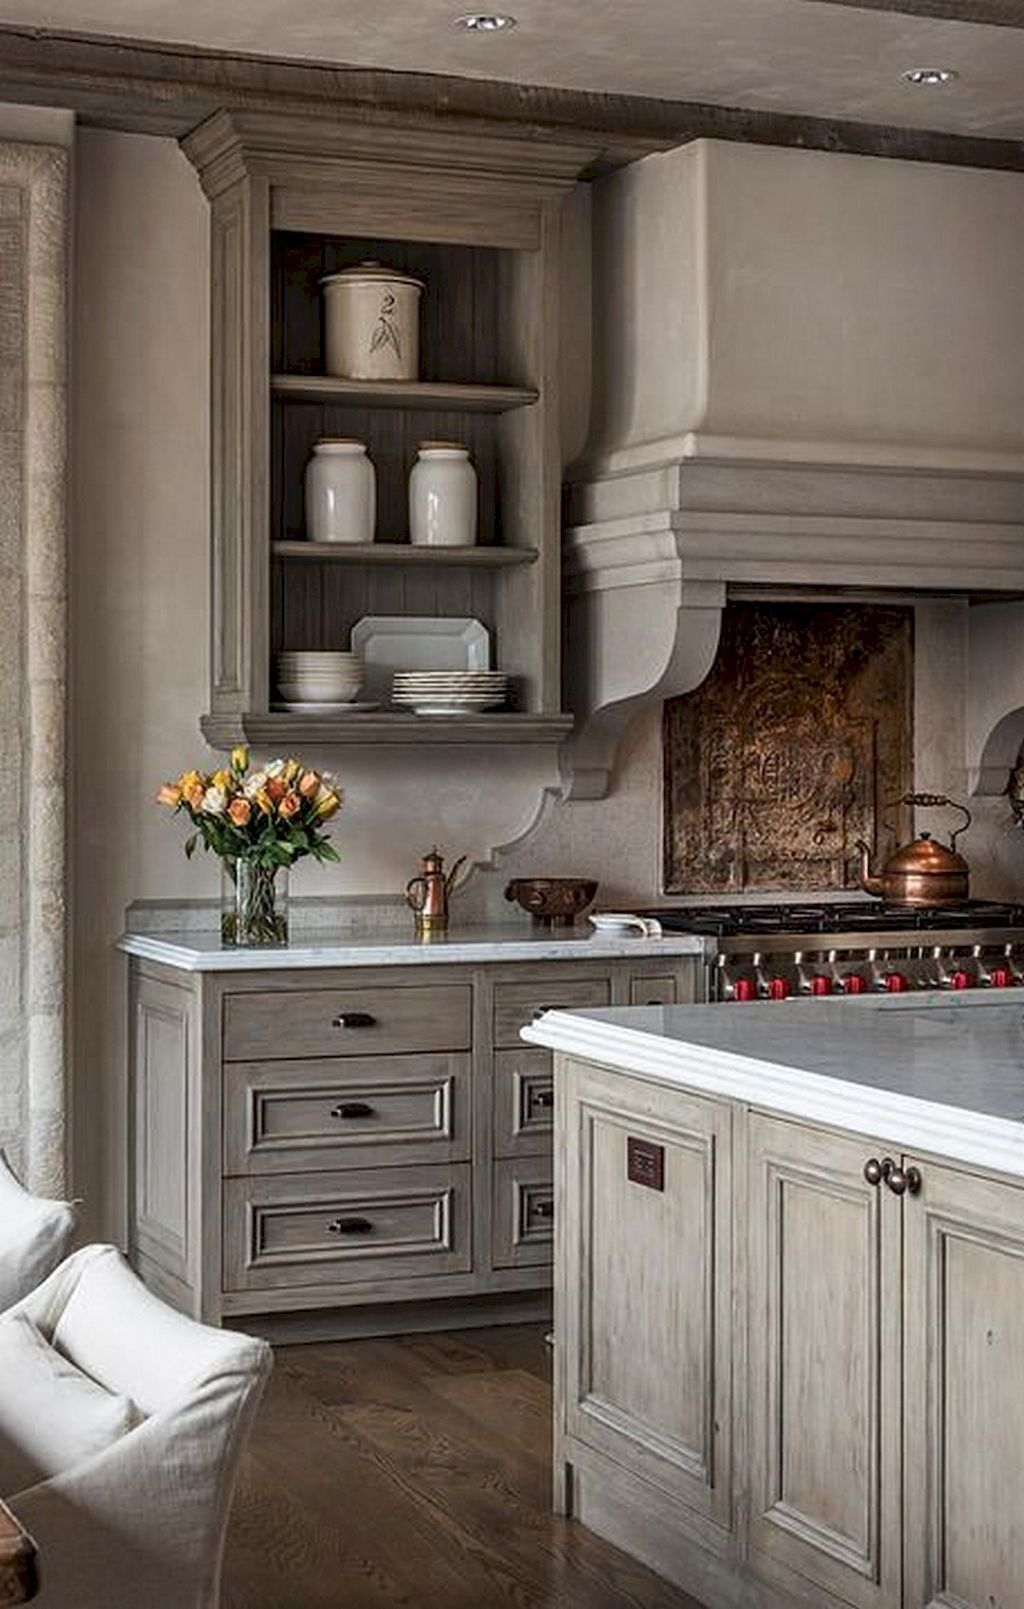 French Country Kitchen Design Decor Ideas 21 Kitchen Design Decor Country Kitchen Modern Kitchen Design